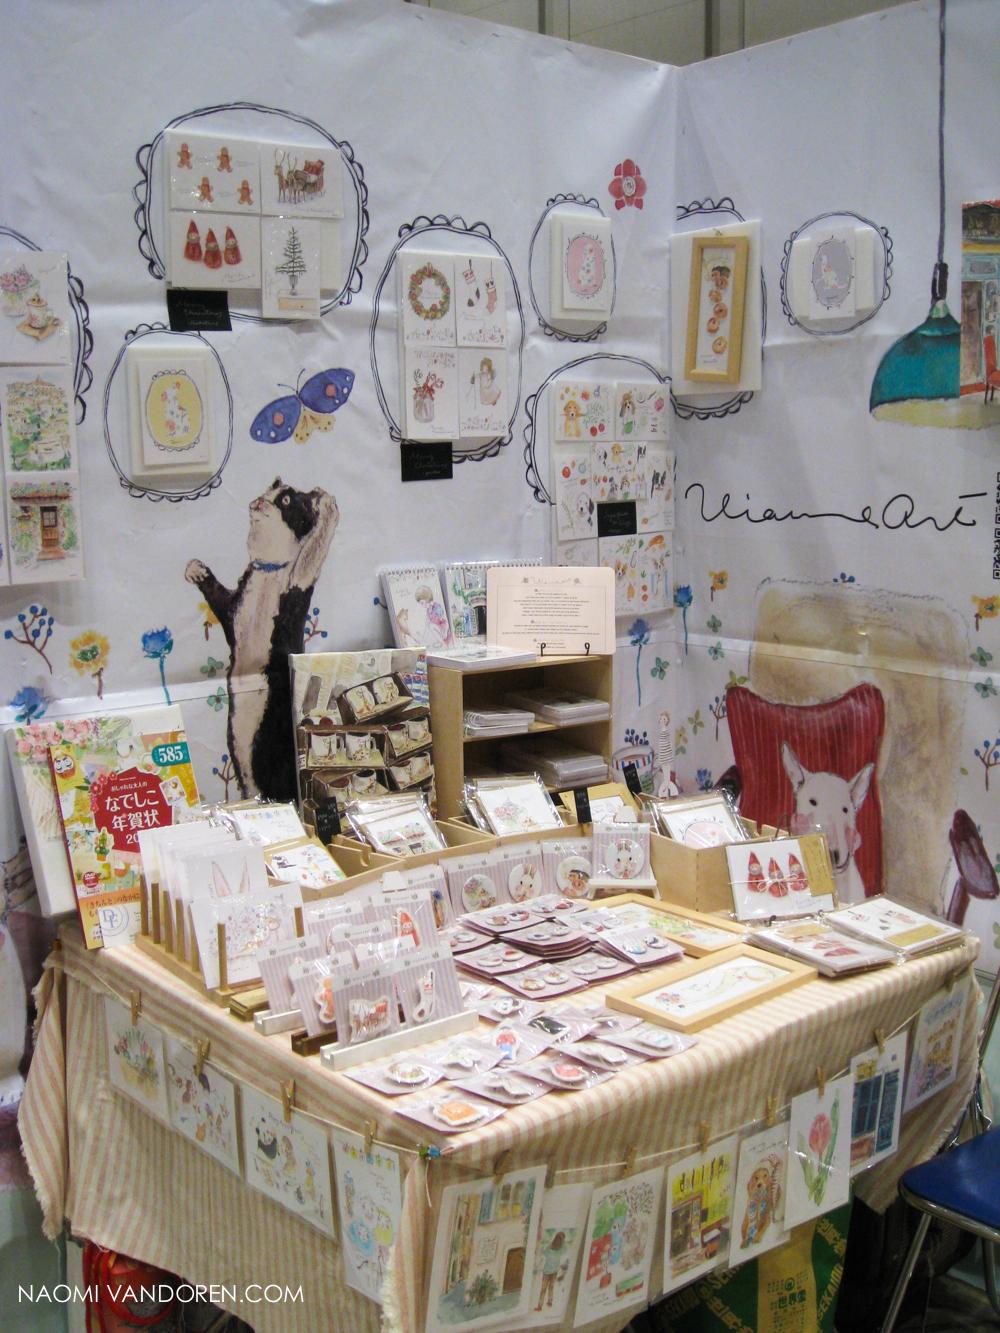 design festa tokyo japan art show naomi vandoren-3.jpg